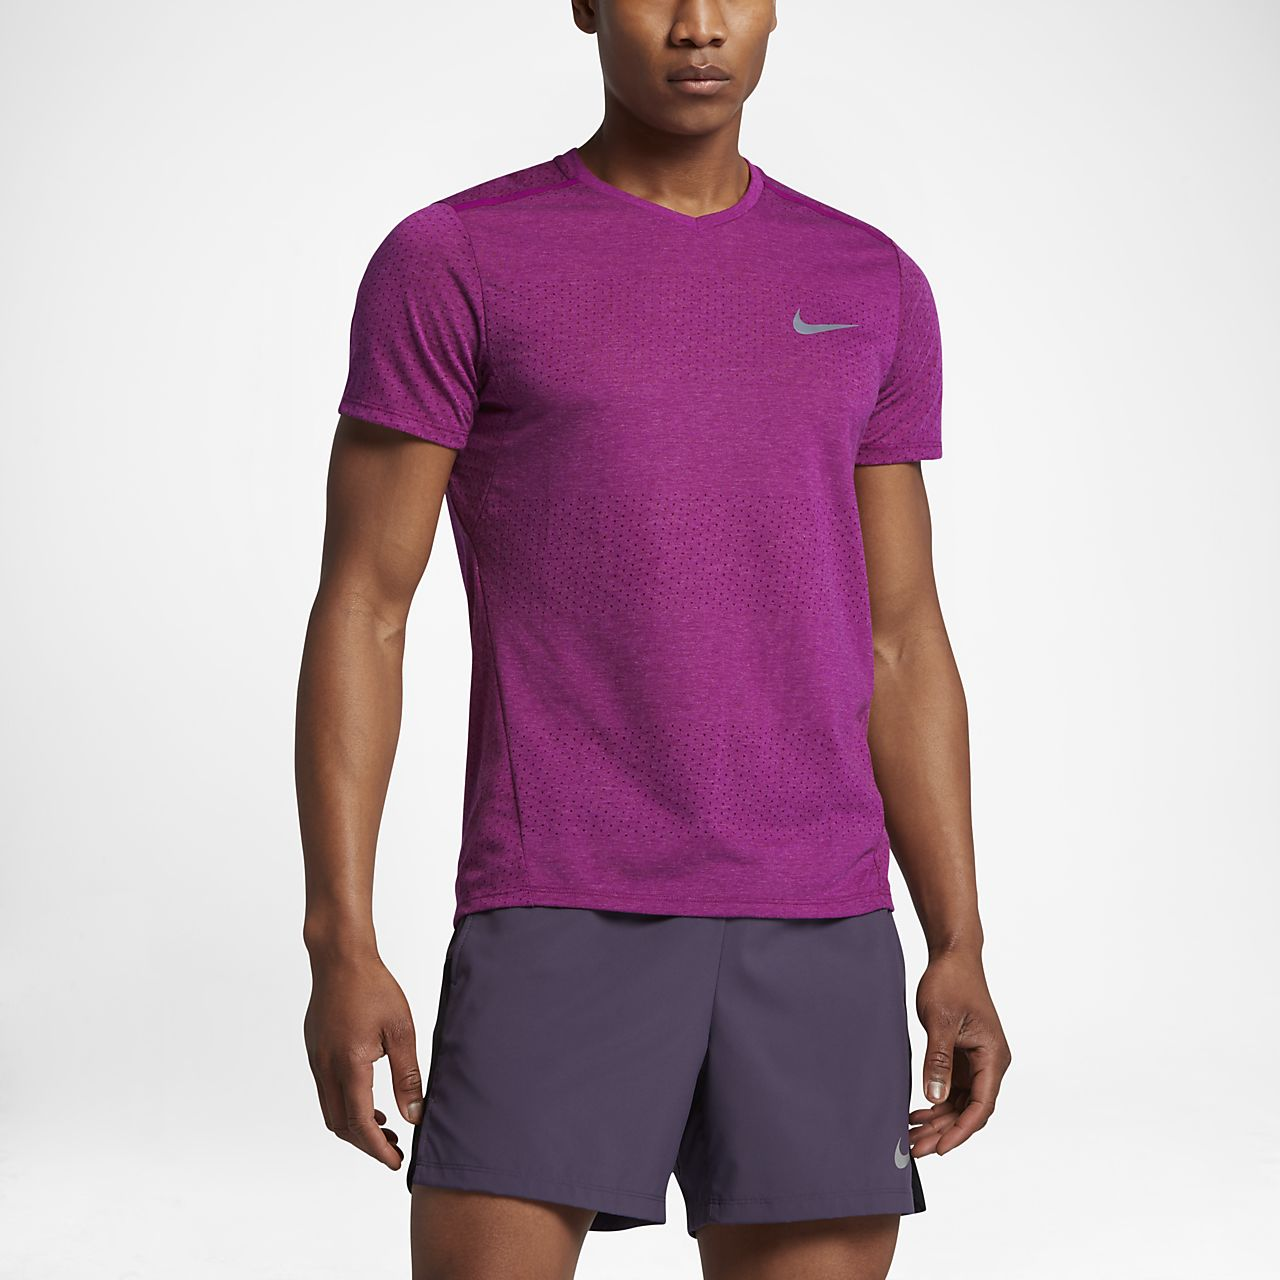 Nike Breathe Men's Short Sleeve Running Top True Berry/Heather